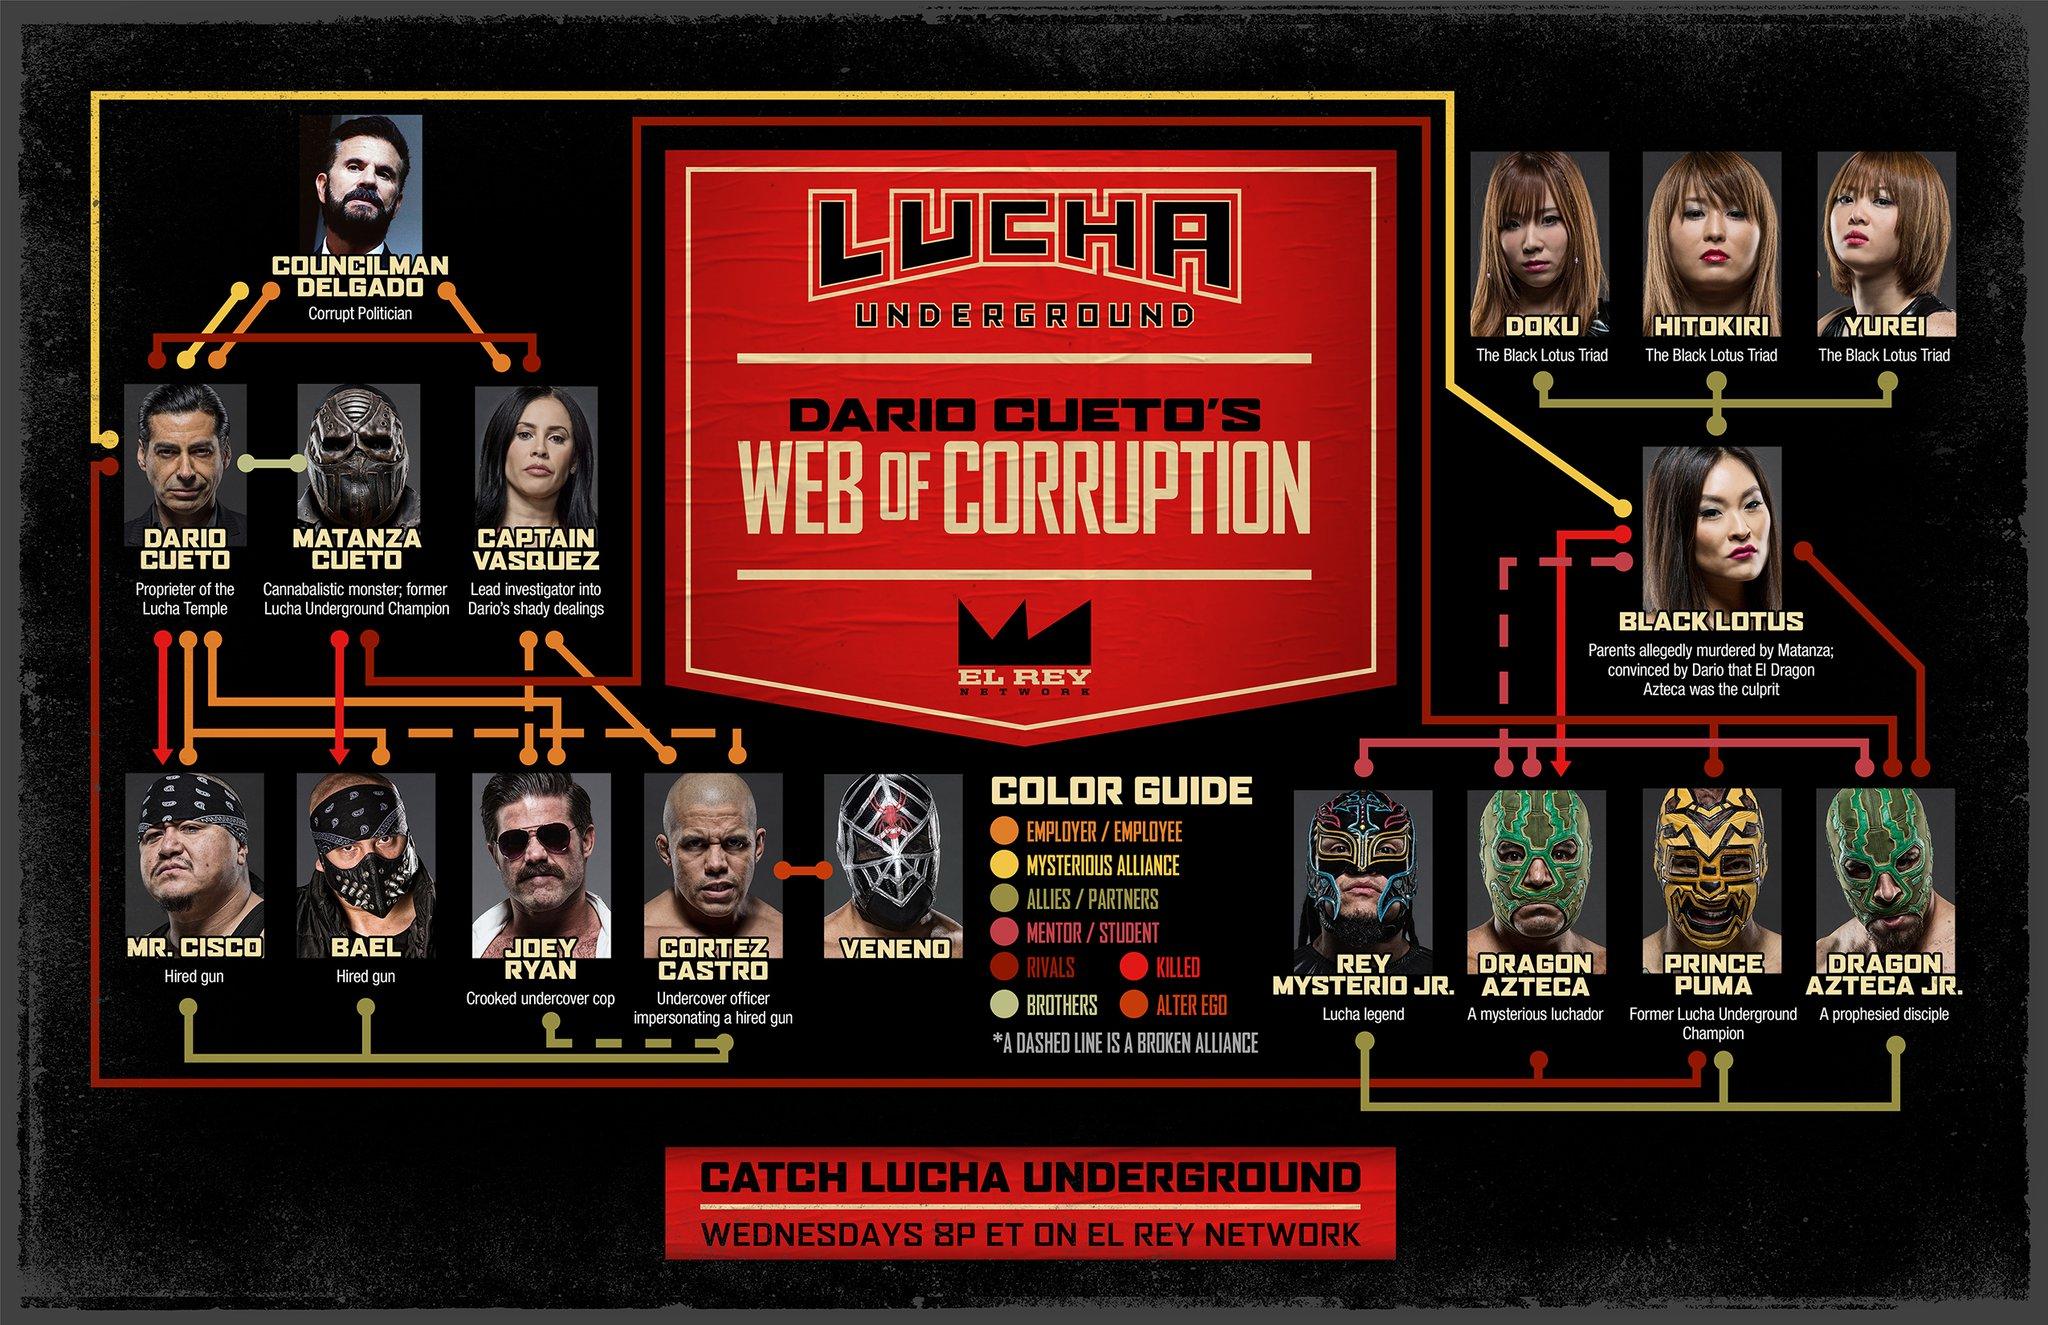 Lucha Underground Live Coverage 5-31 Mid Season Premiere!